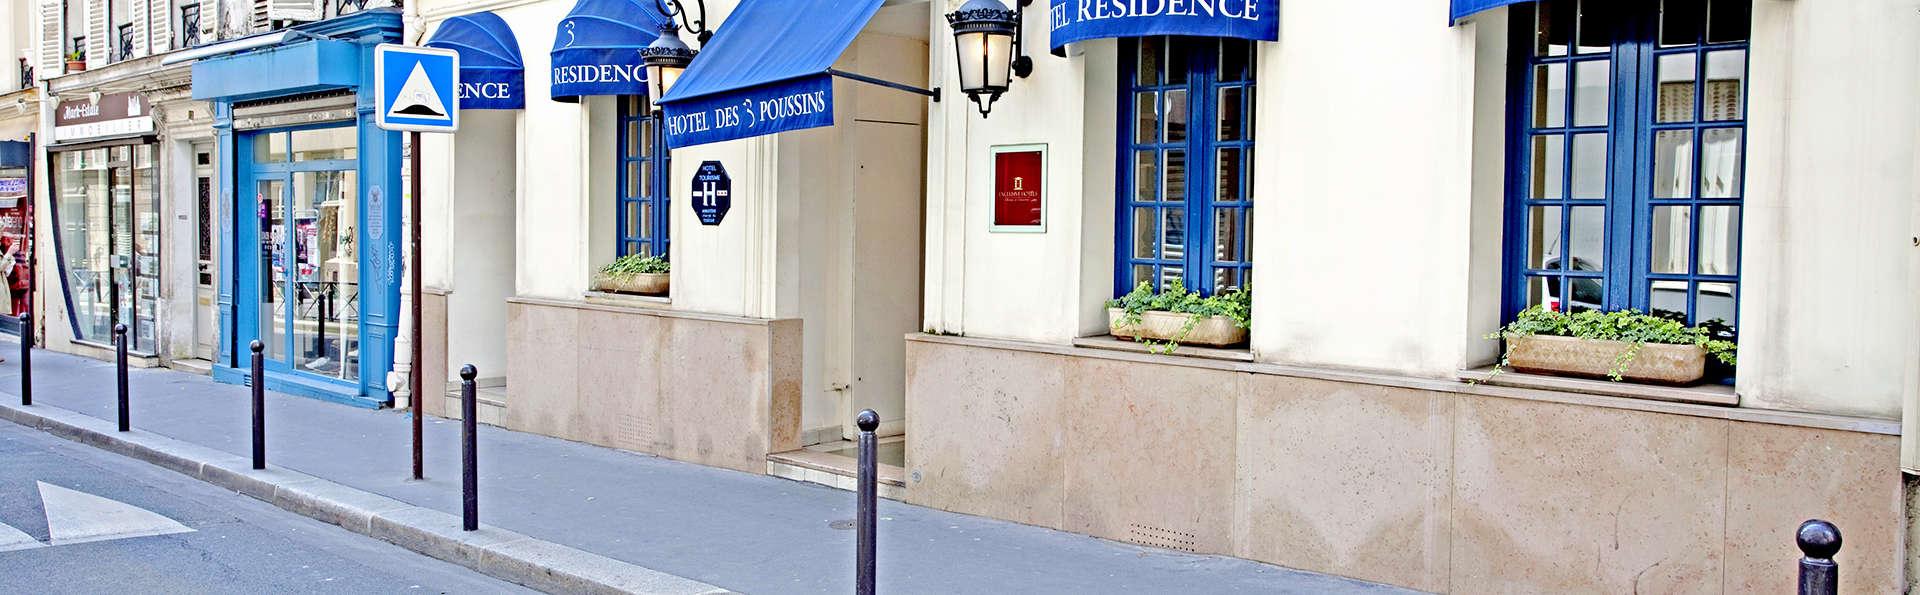 Hôtel des 3 Poussins - EDIT_Fachada_1.jpg